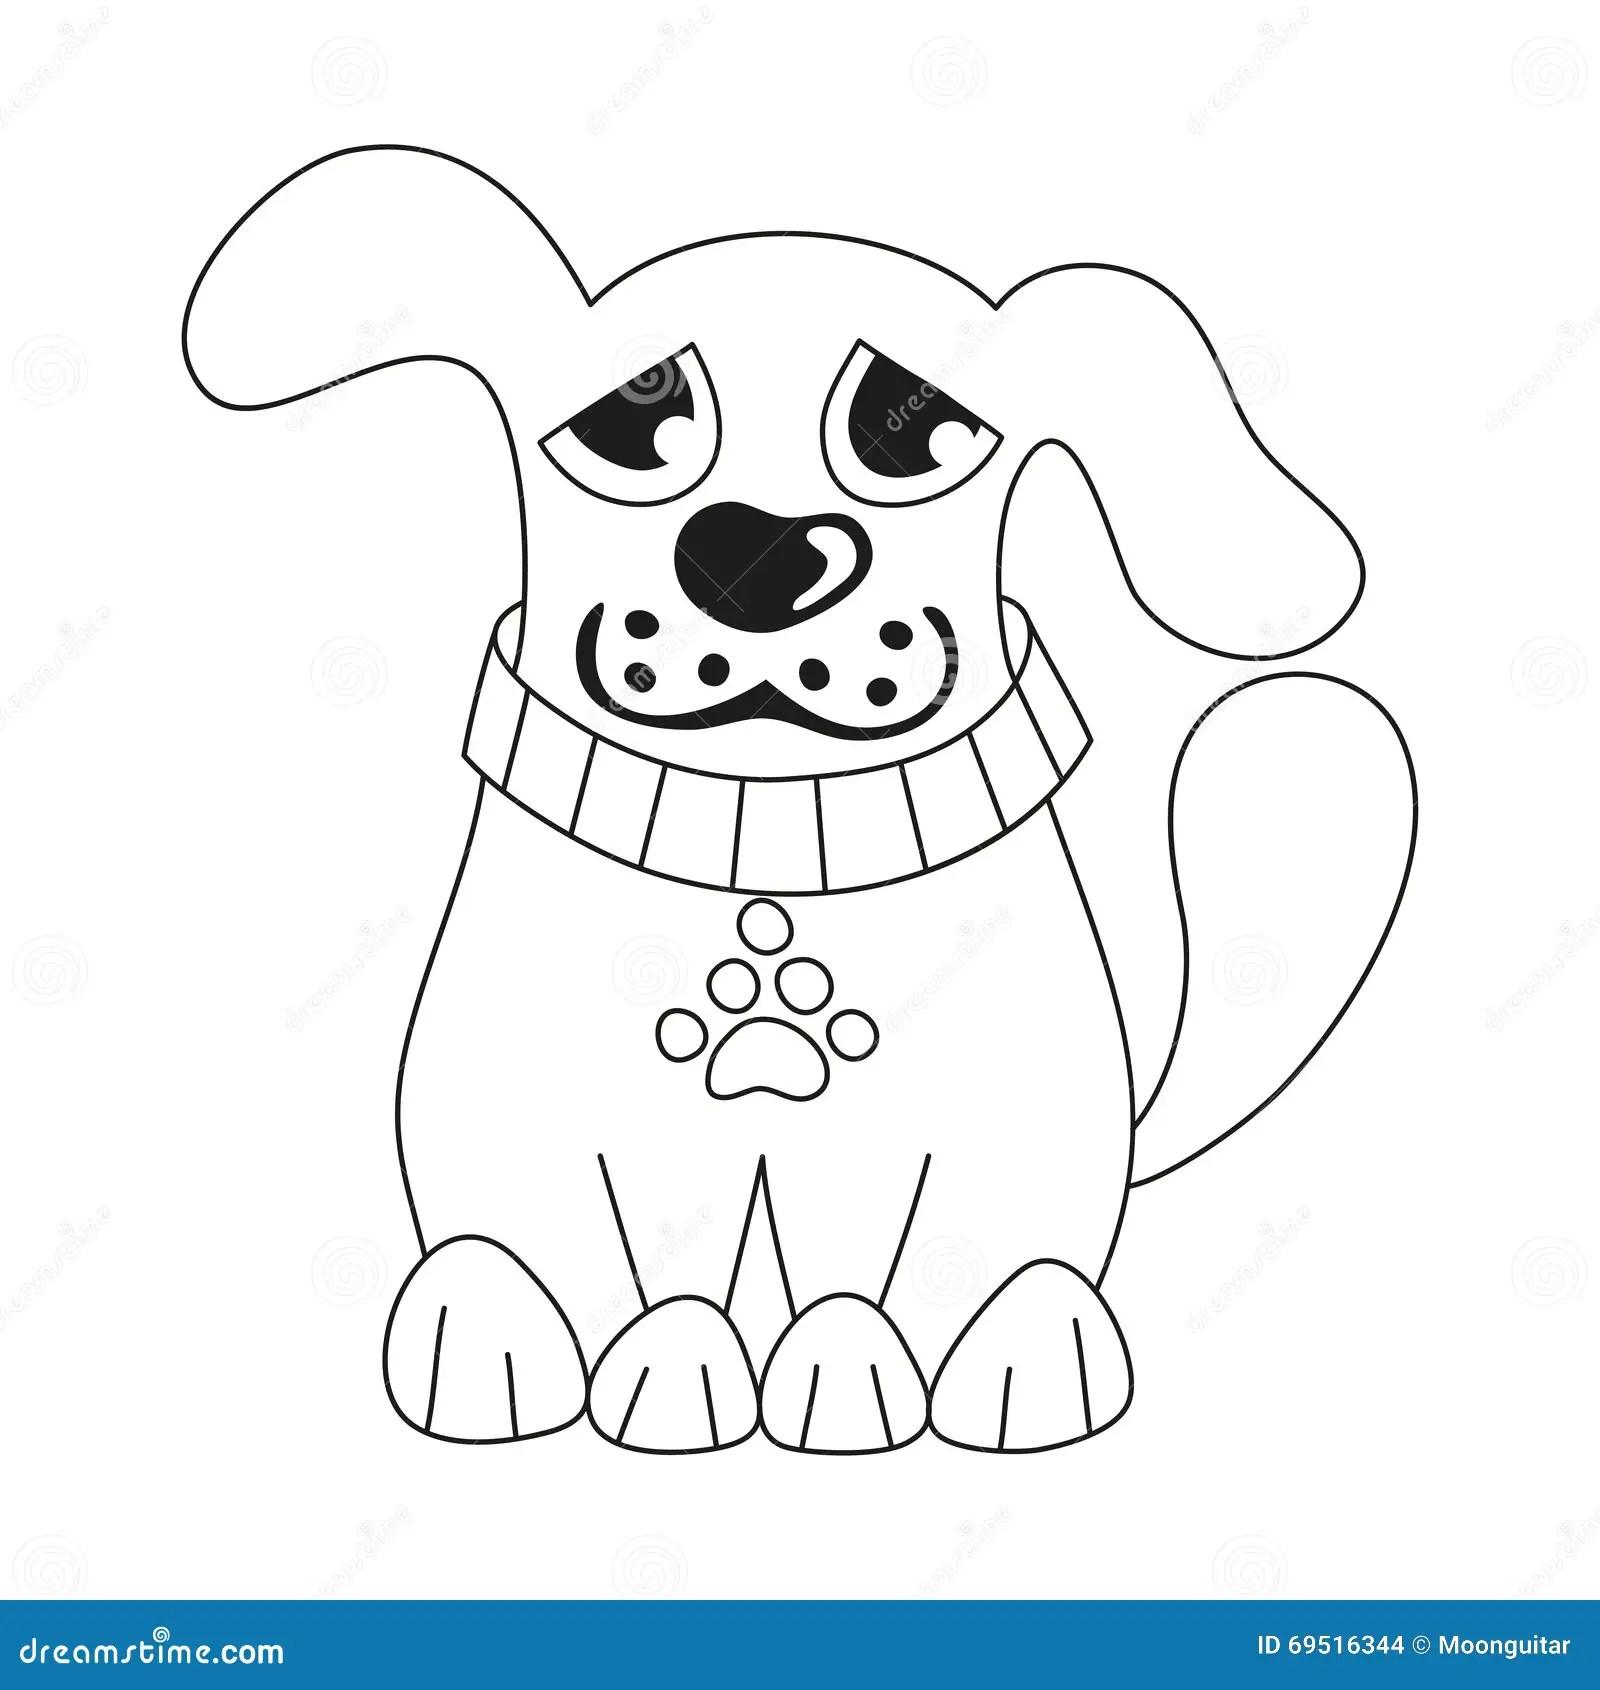 Sad Puppy Coloring Pages Get Sketch Coloring Page